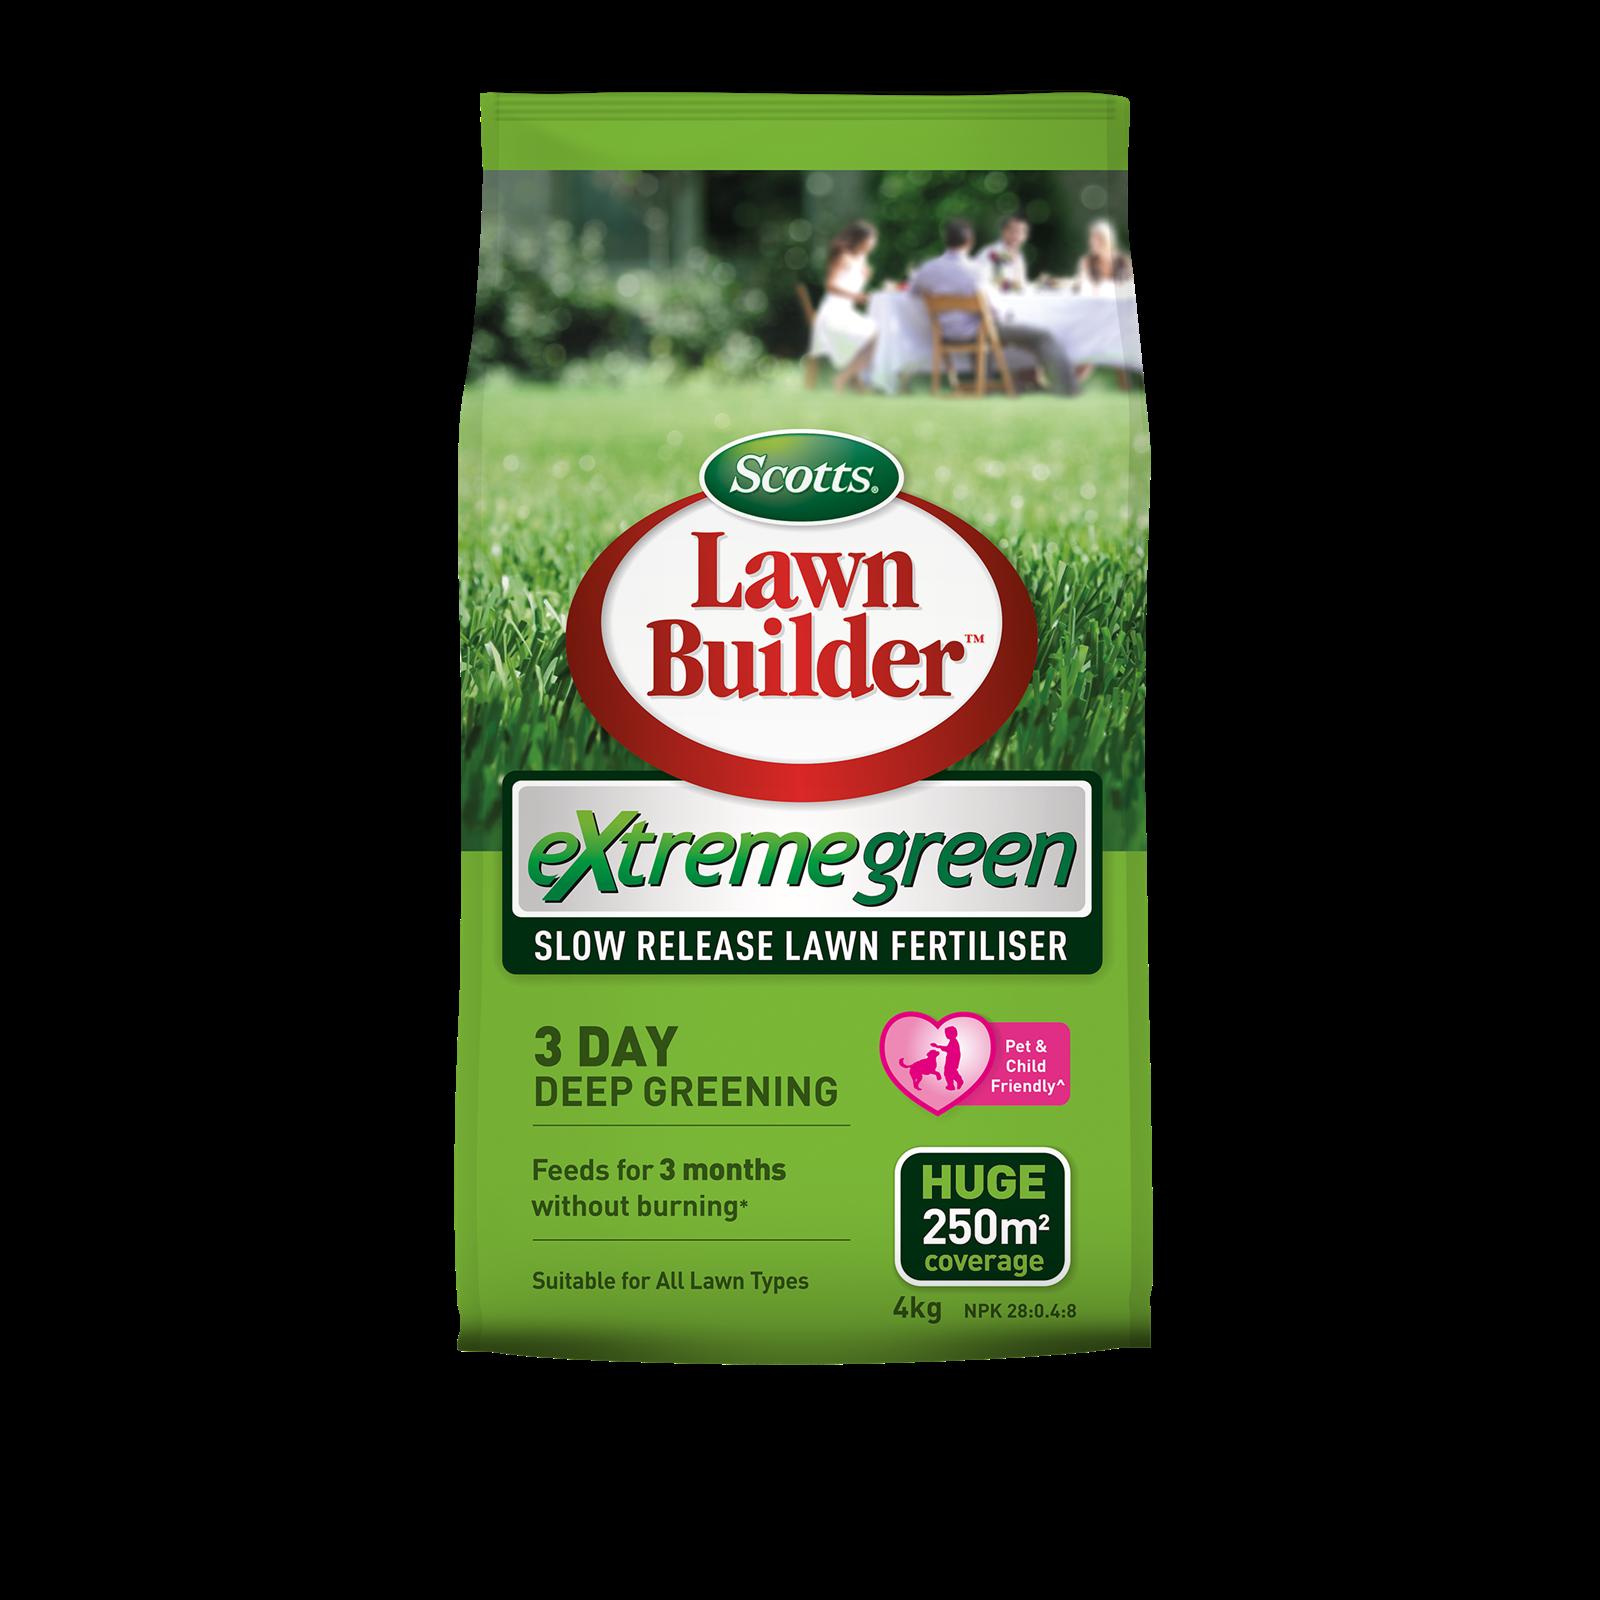 Scotts Lawn Builder 4kg Extreme Green Slow Release Lawn Fertiliser